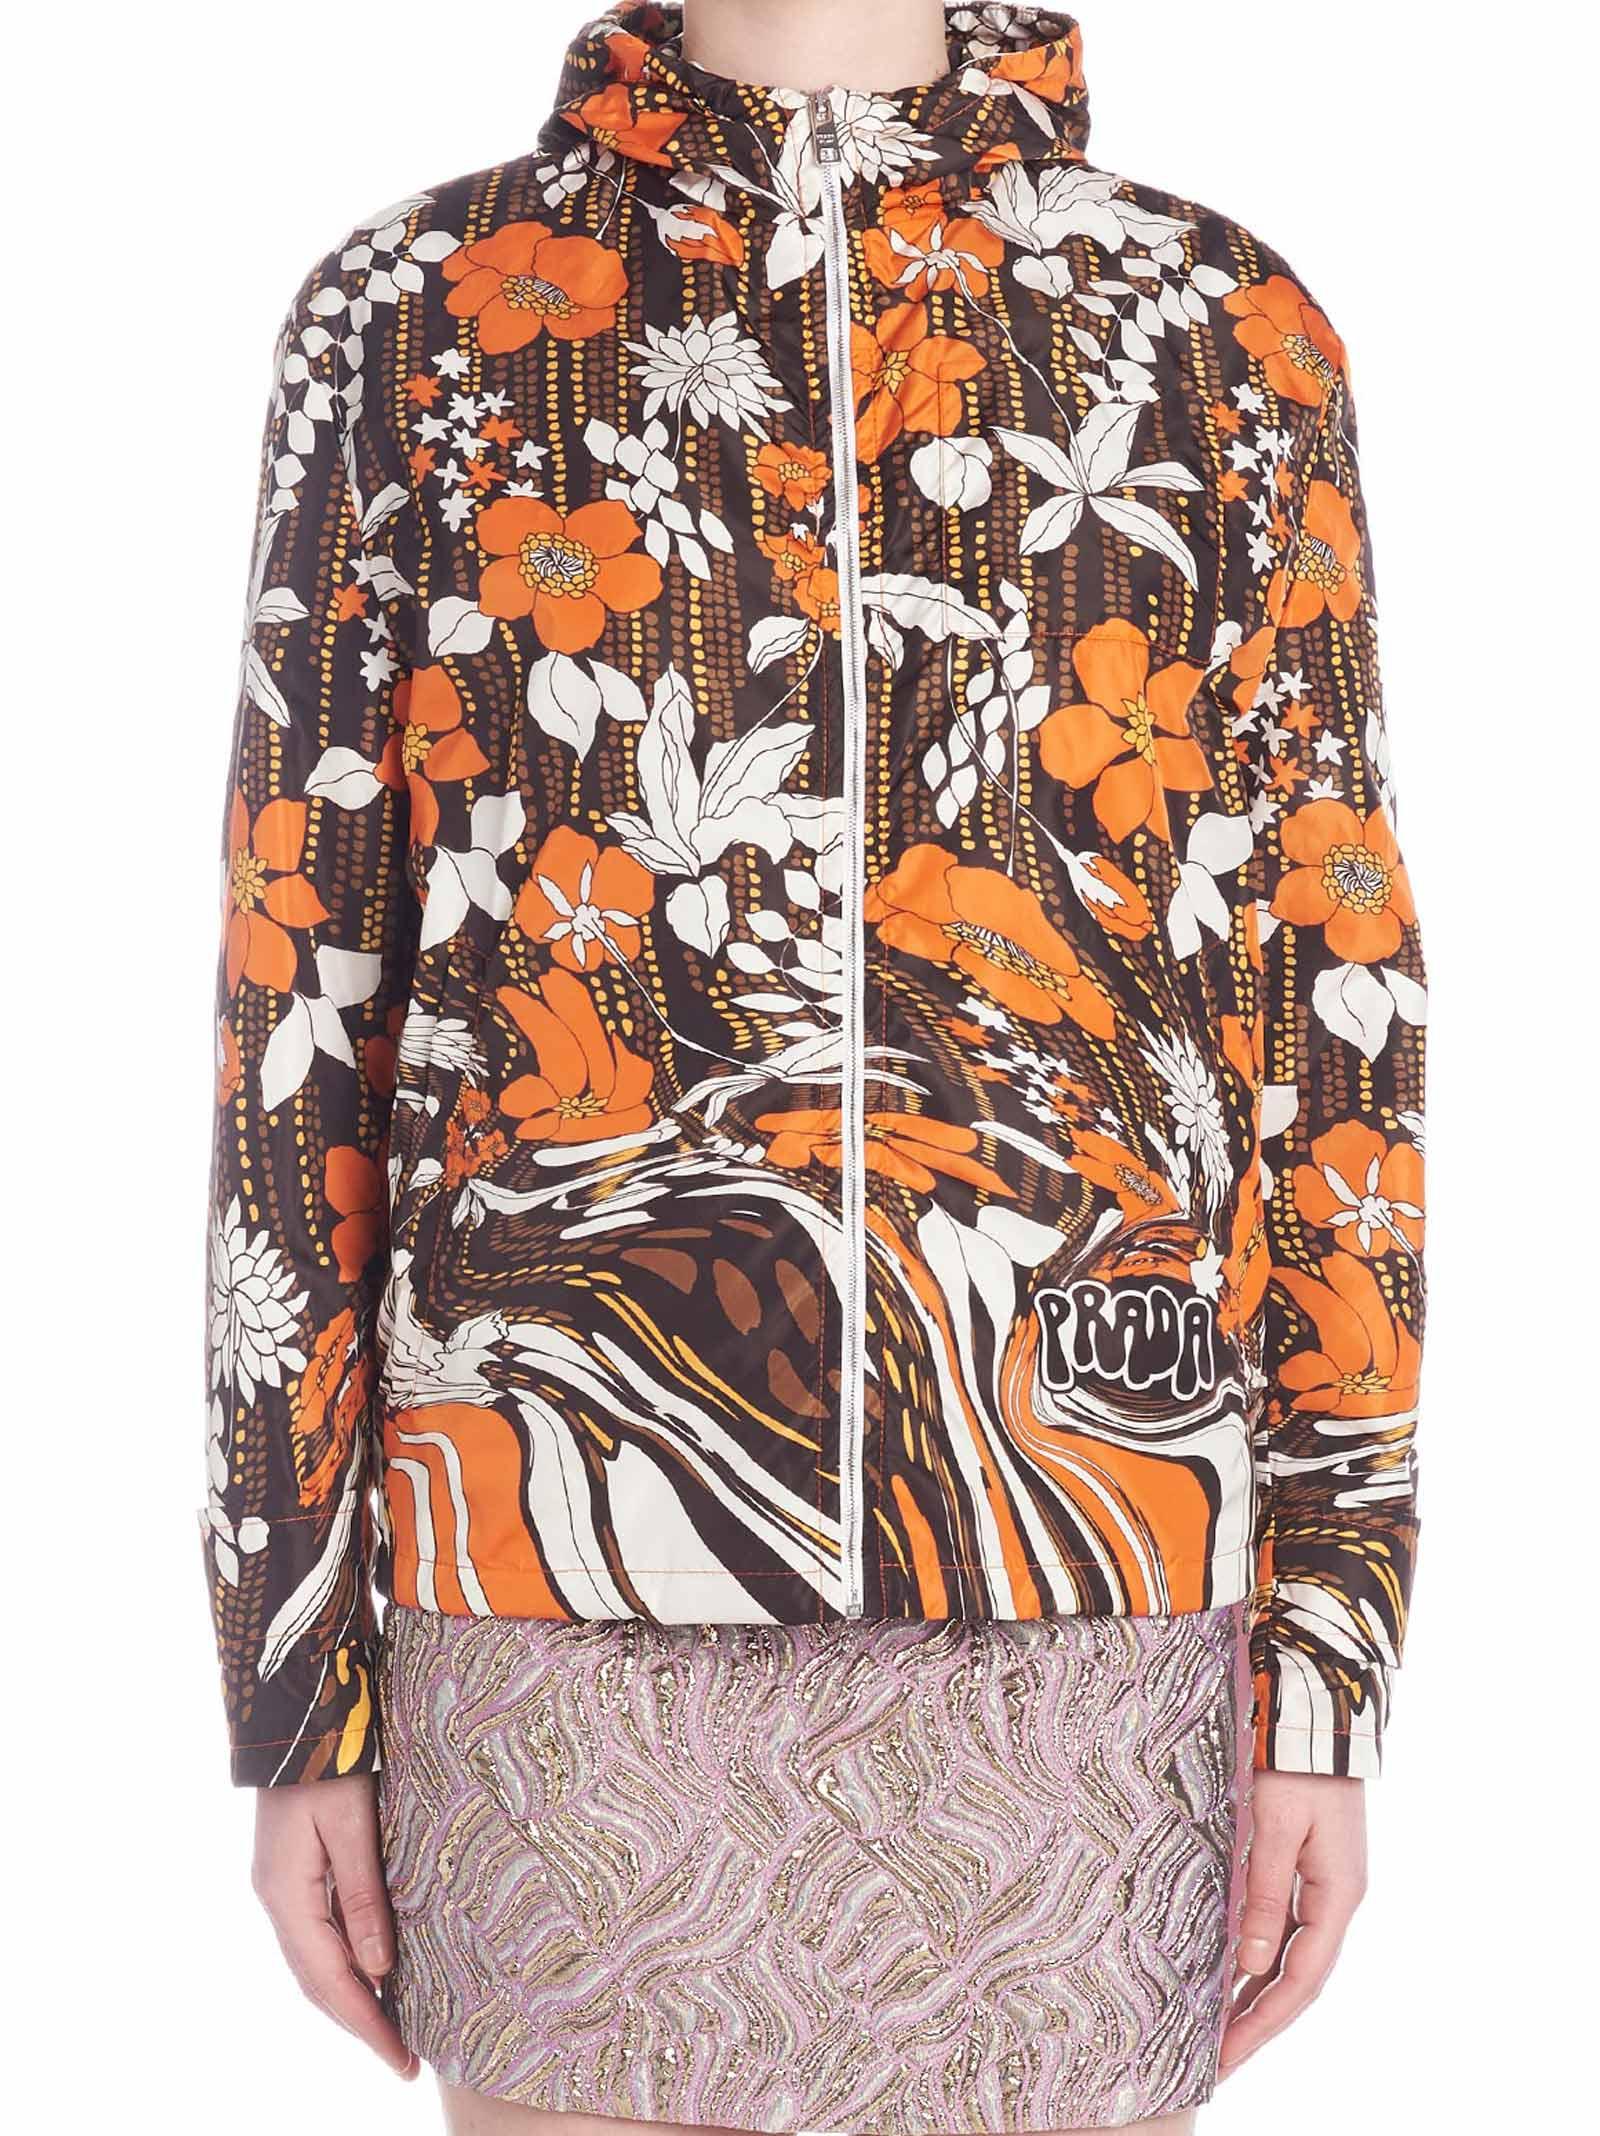 Prada flower 2 Jacket